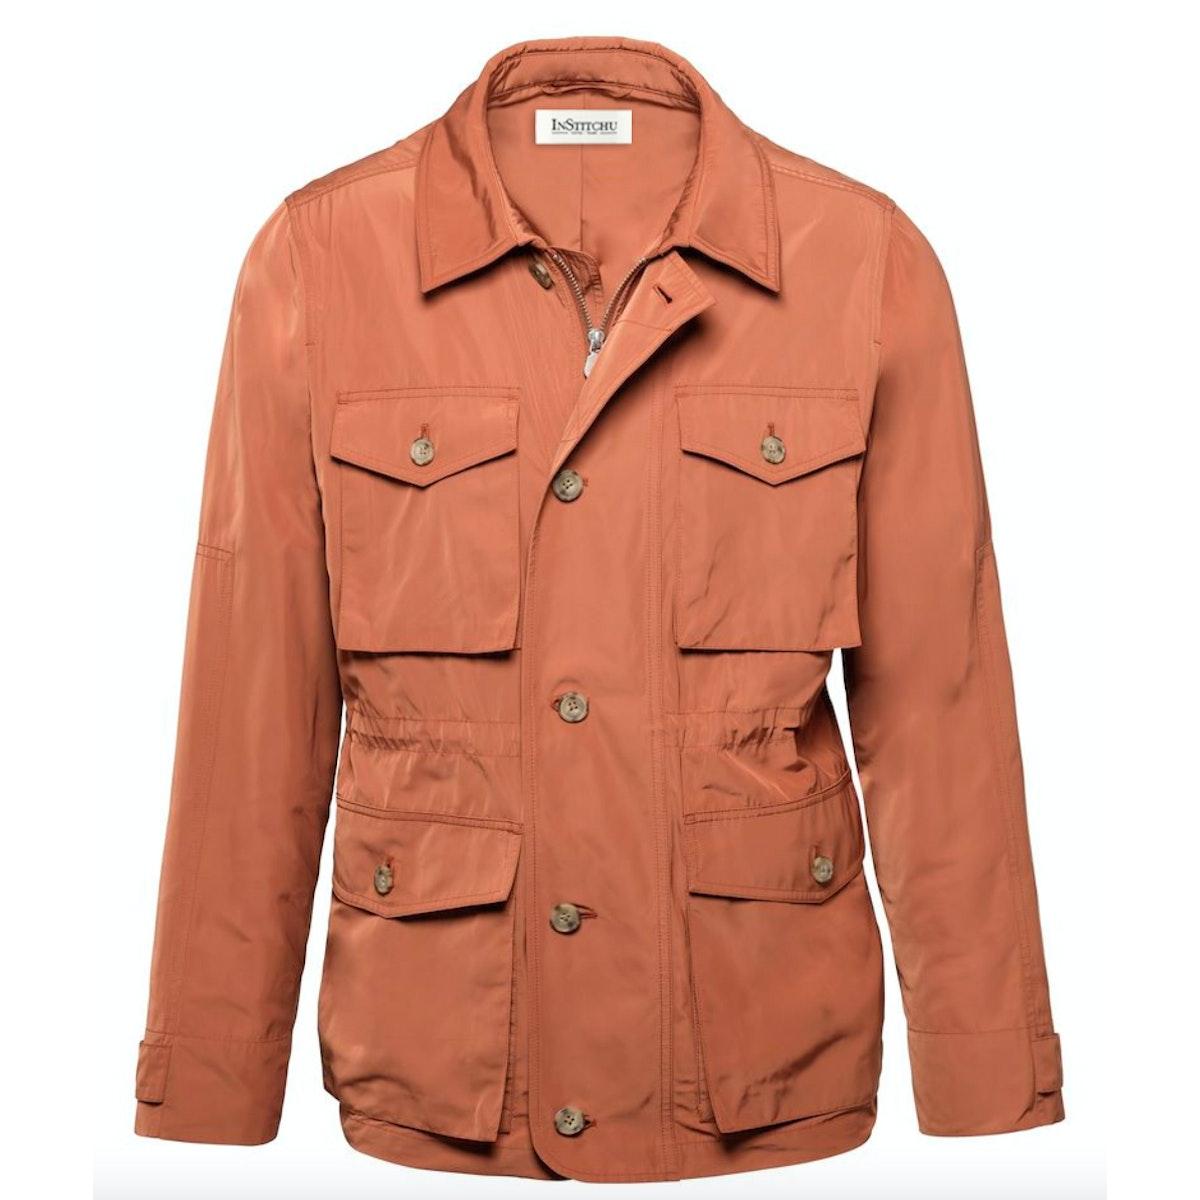 The Hunt Clay Field Jacket